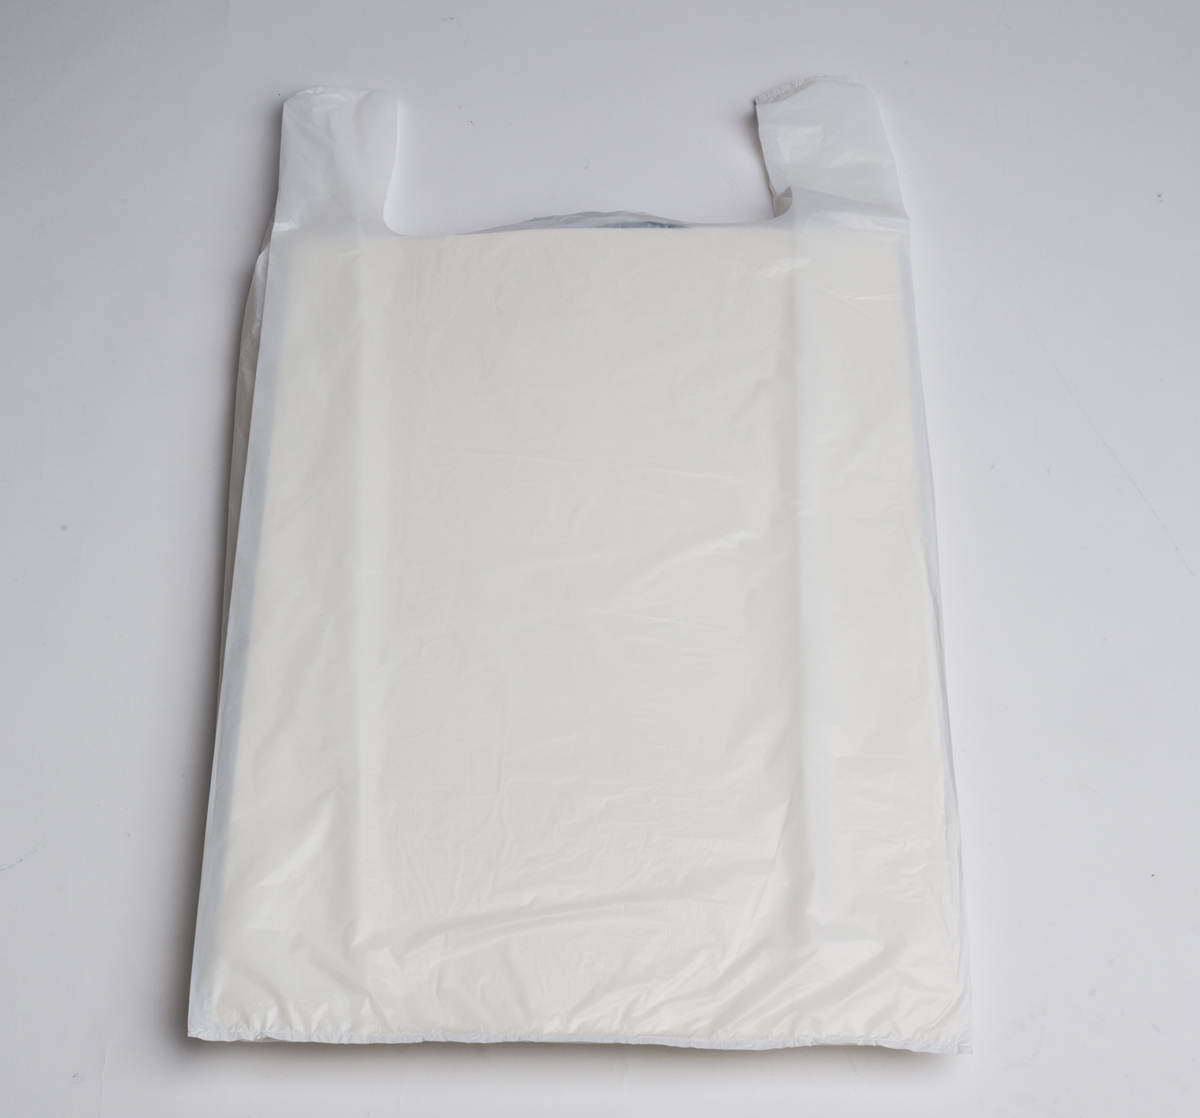 white plastic t shirt bags jumbo a b store fixtures ForJumbo T Shirt Bags